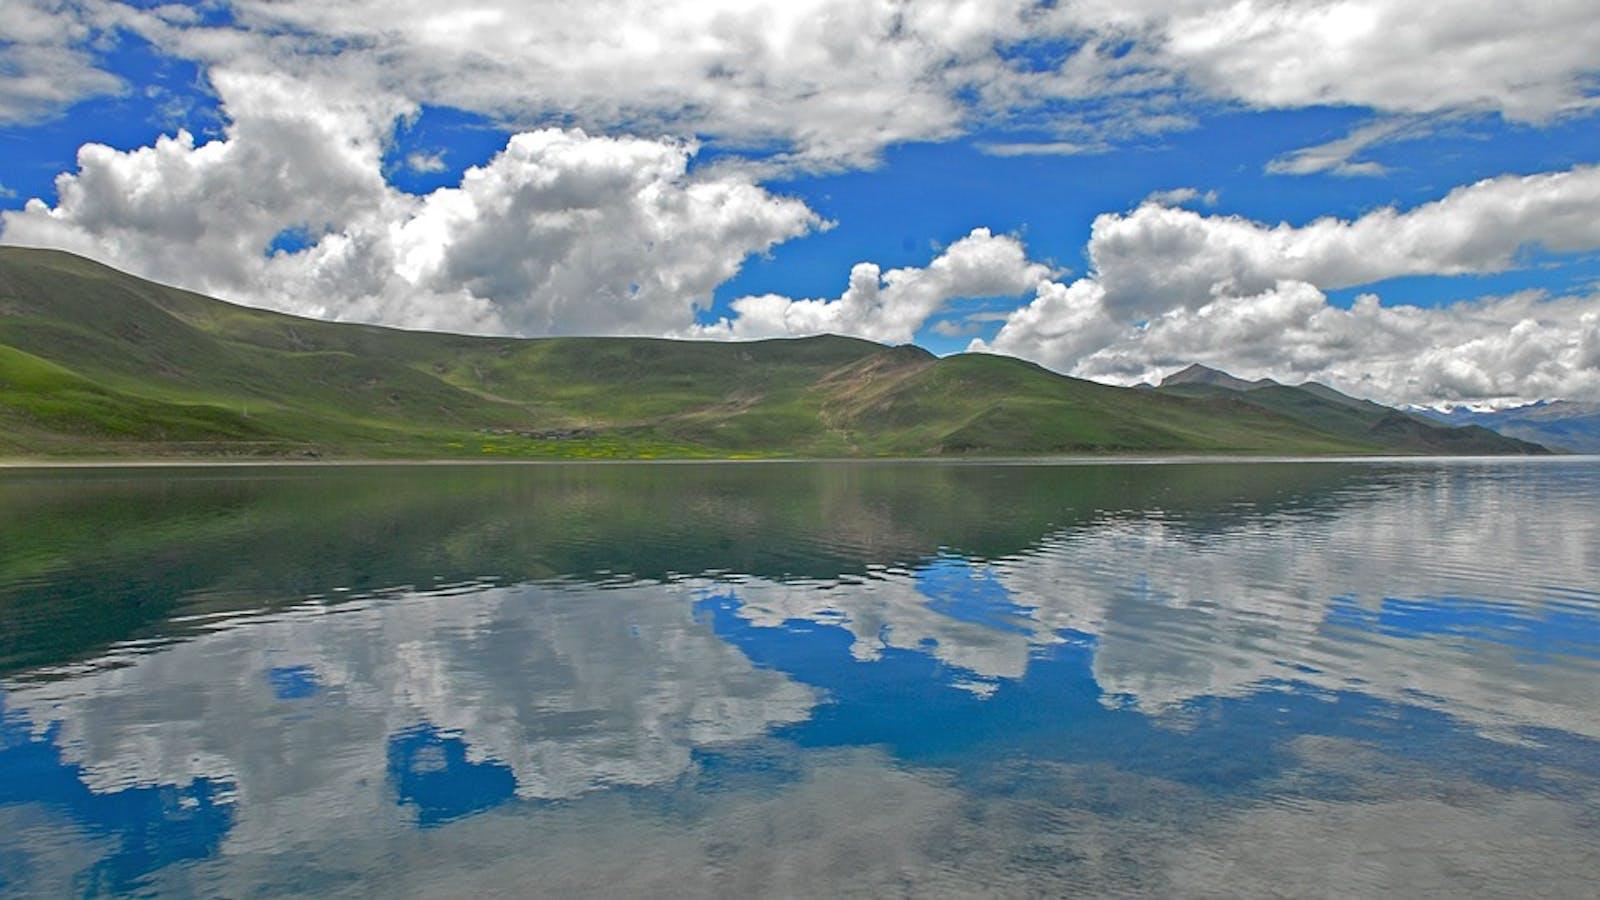 Yarlung Zanbo Arid Steppe